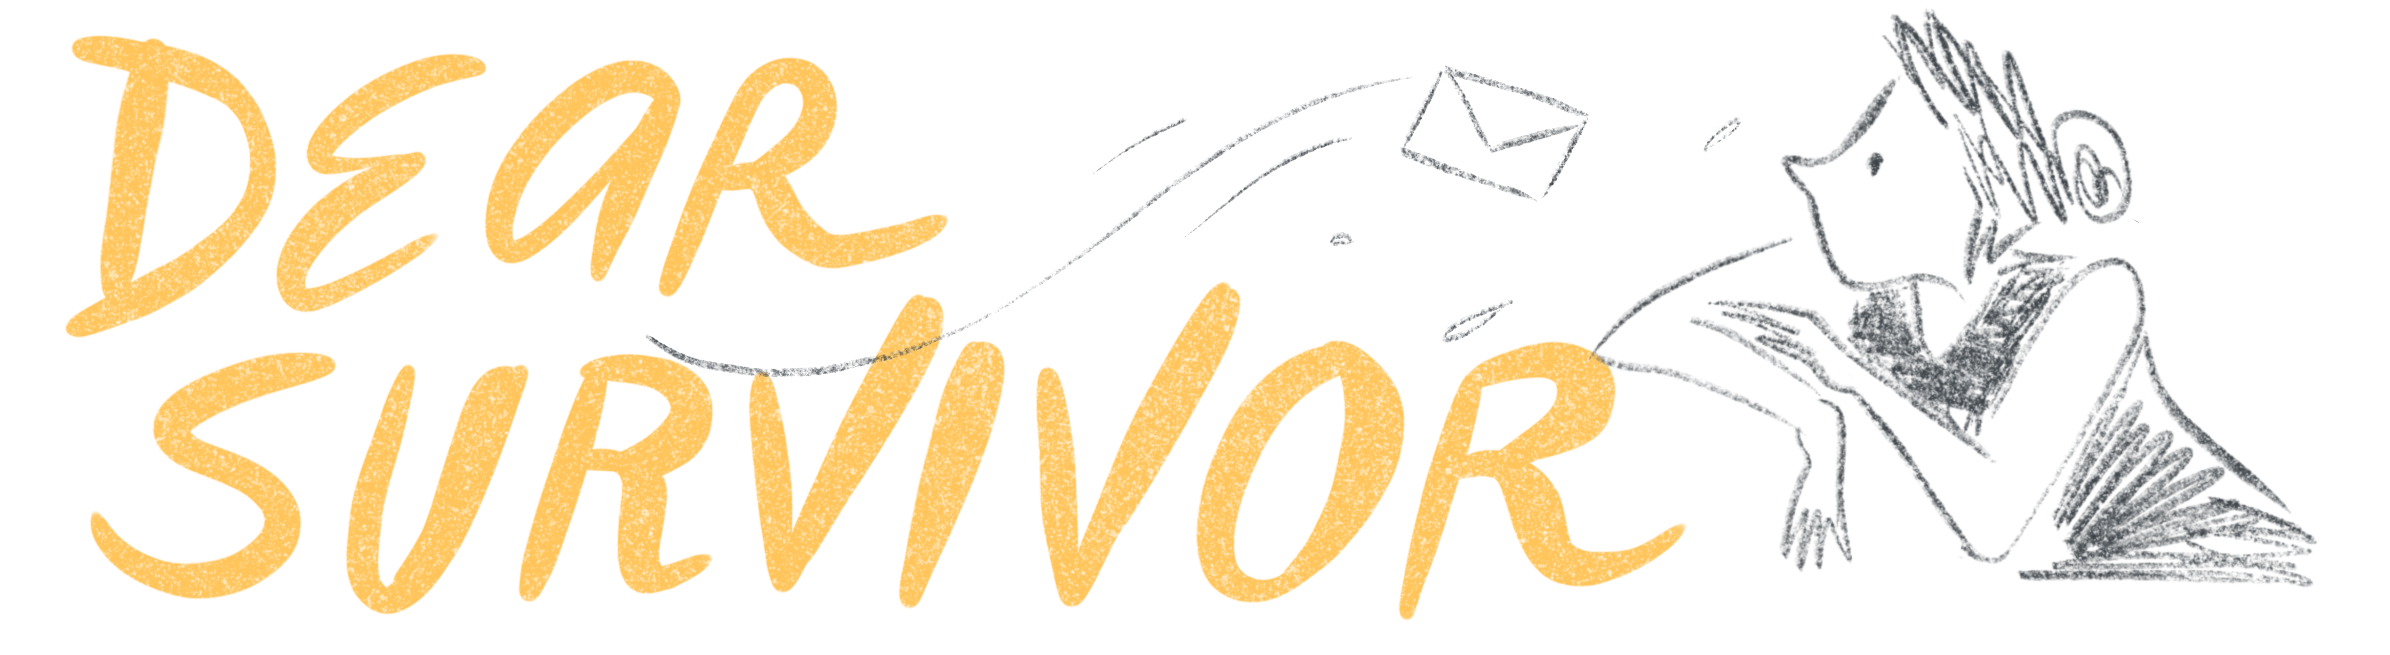 The Dear Survivor Project